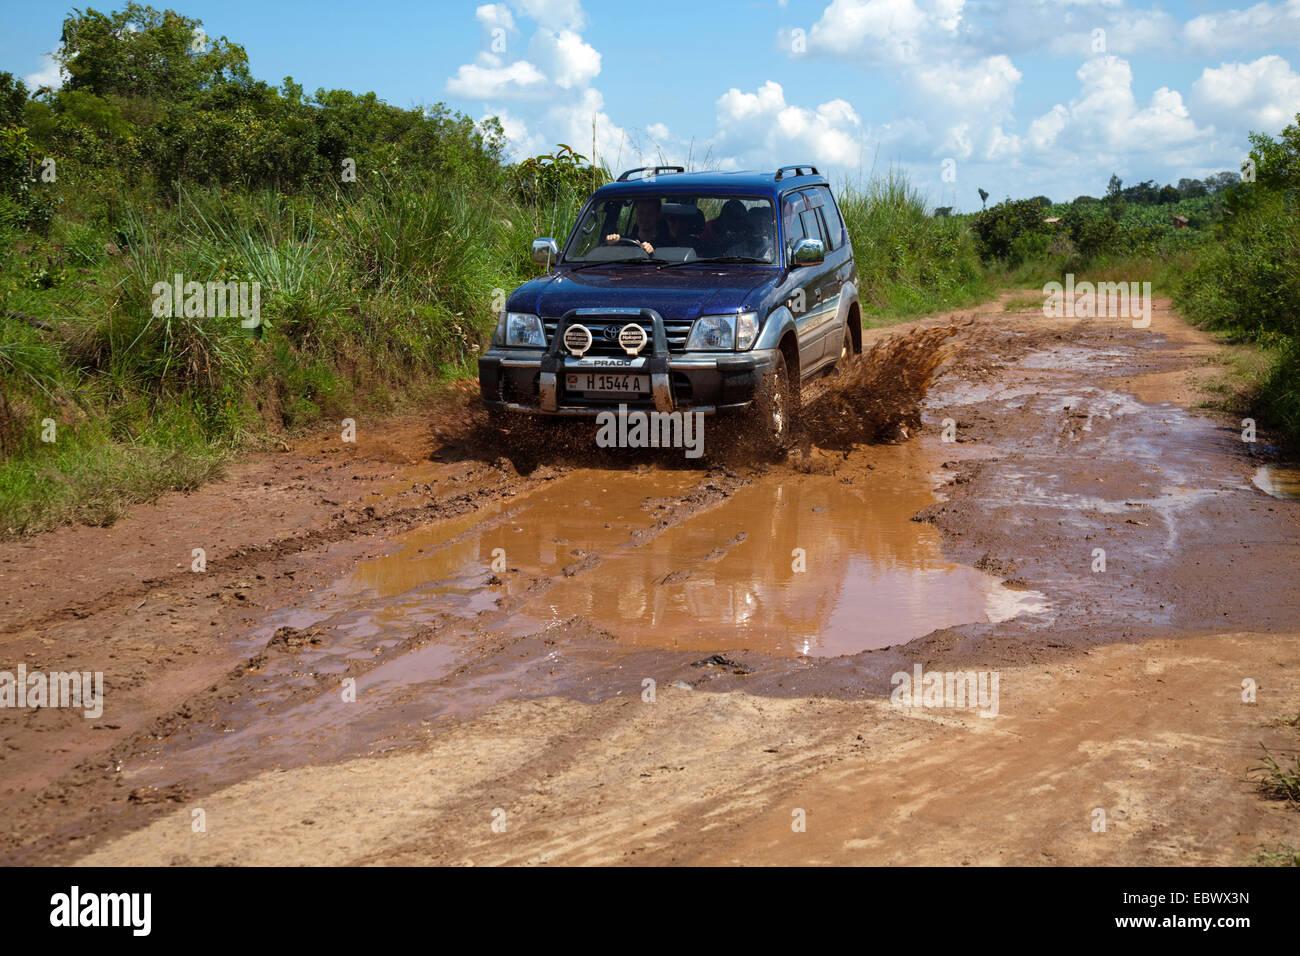 cross-country vehicle driving through a mud pit on a soil road through bush landscape, Burundi, Cankuzo, National - Stock Image